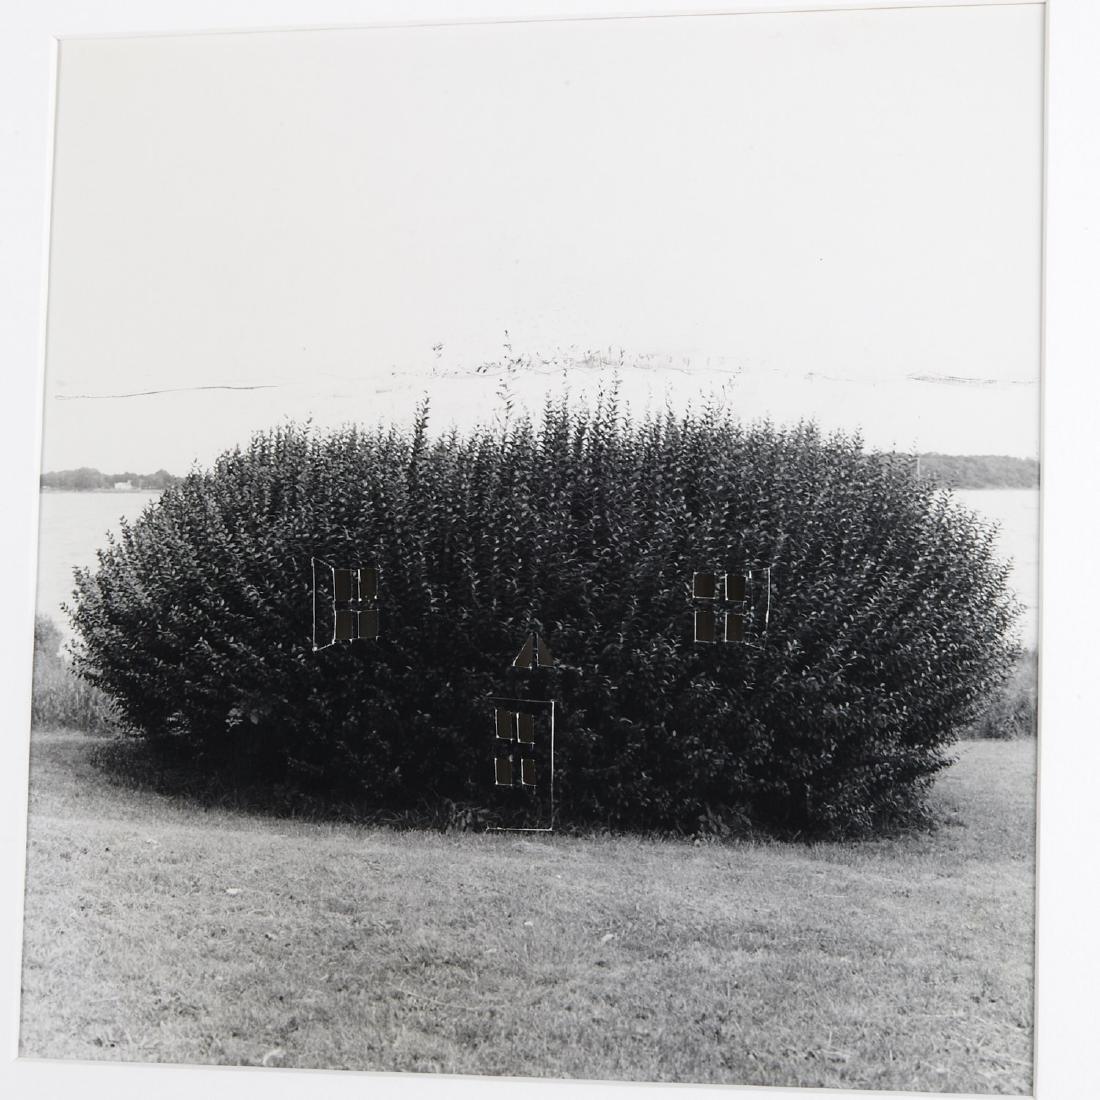 William Wegman, photograph - 2